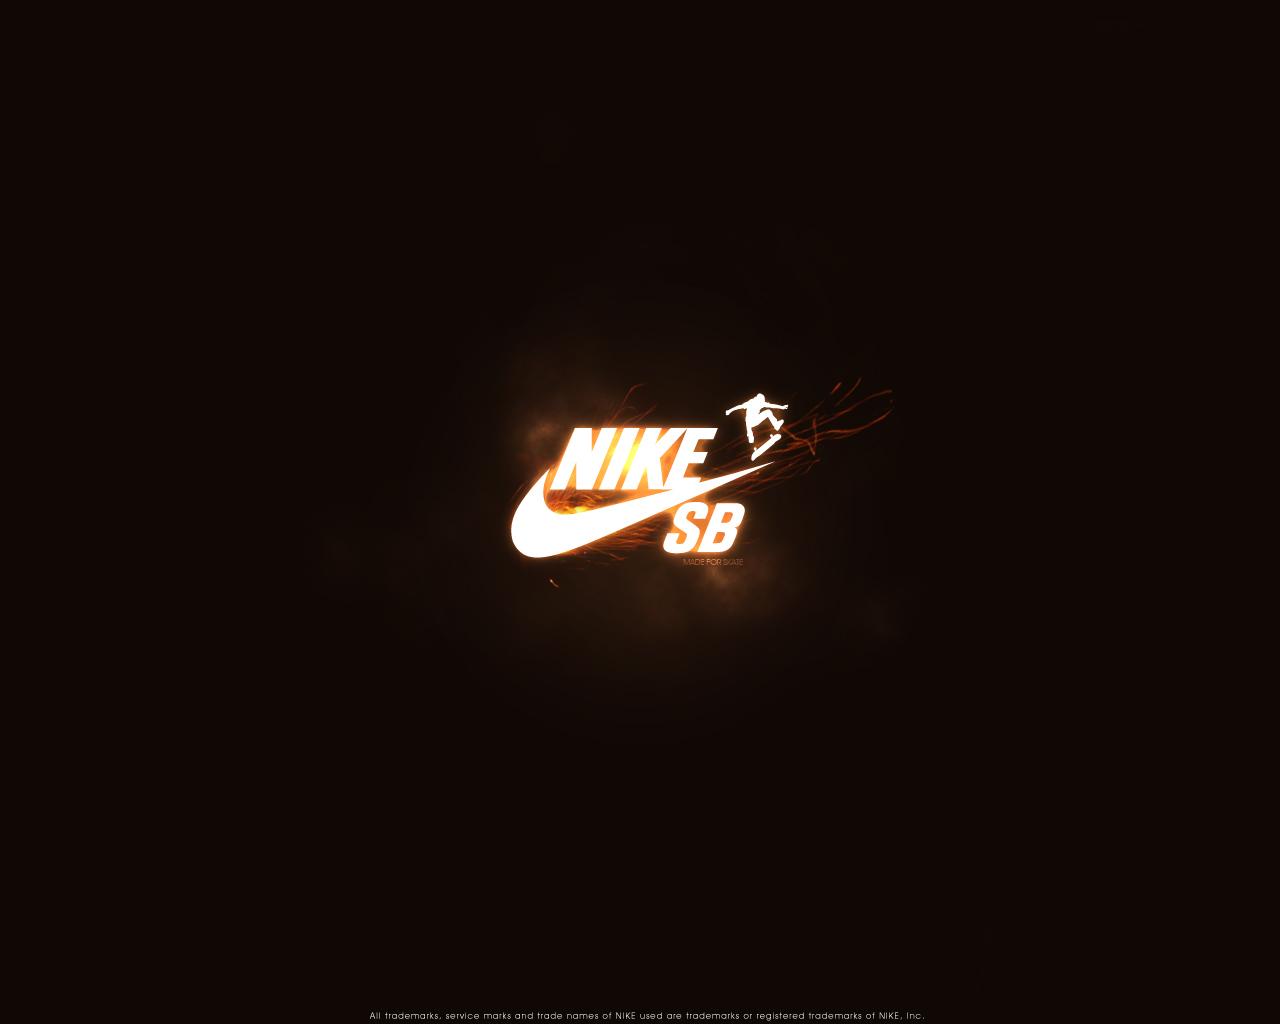 Nike Ipad Wallpaper: Nike SB Wallpaper For IPhone